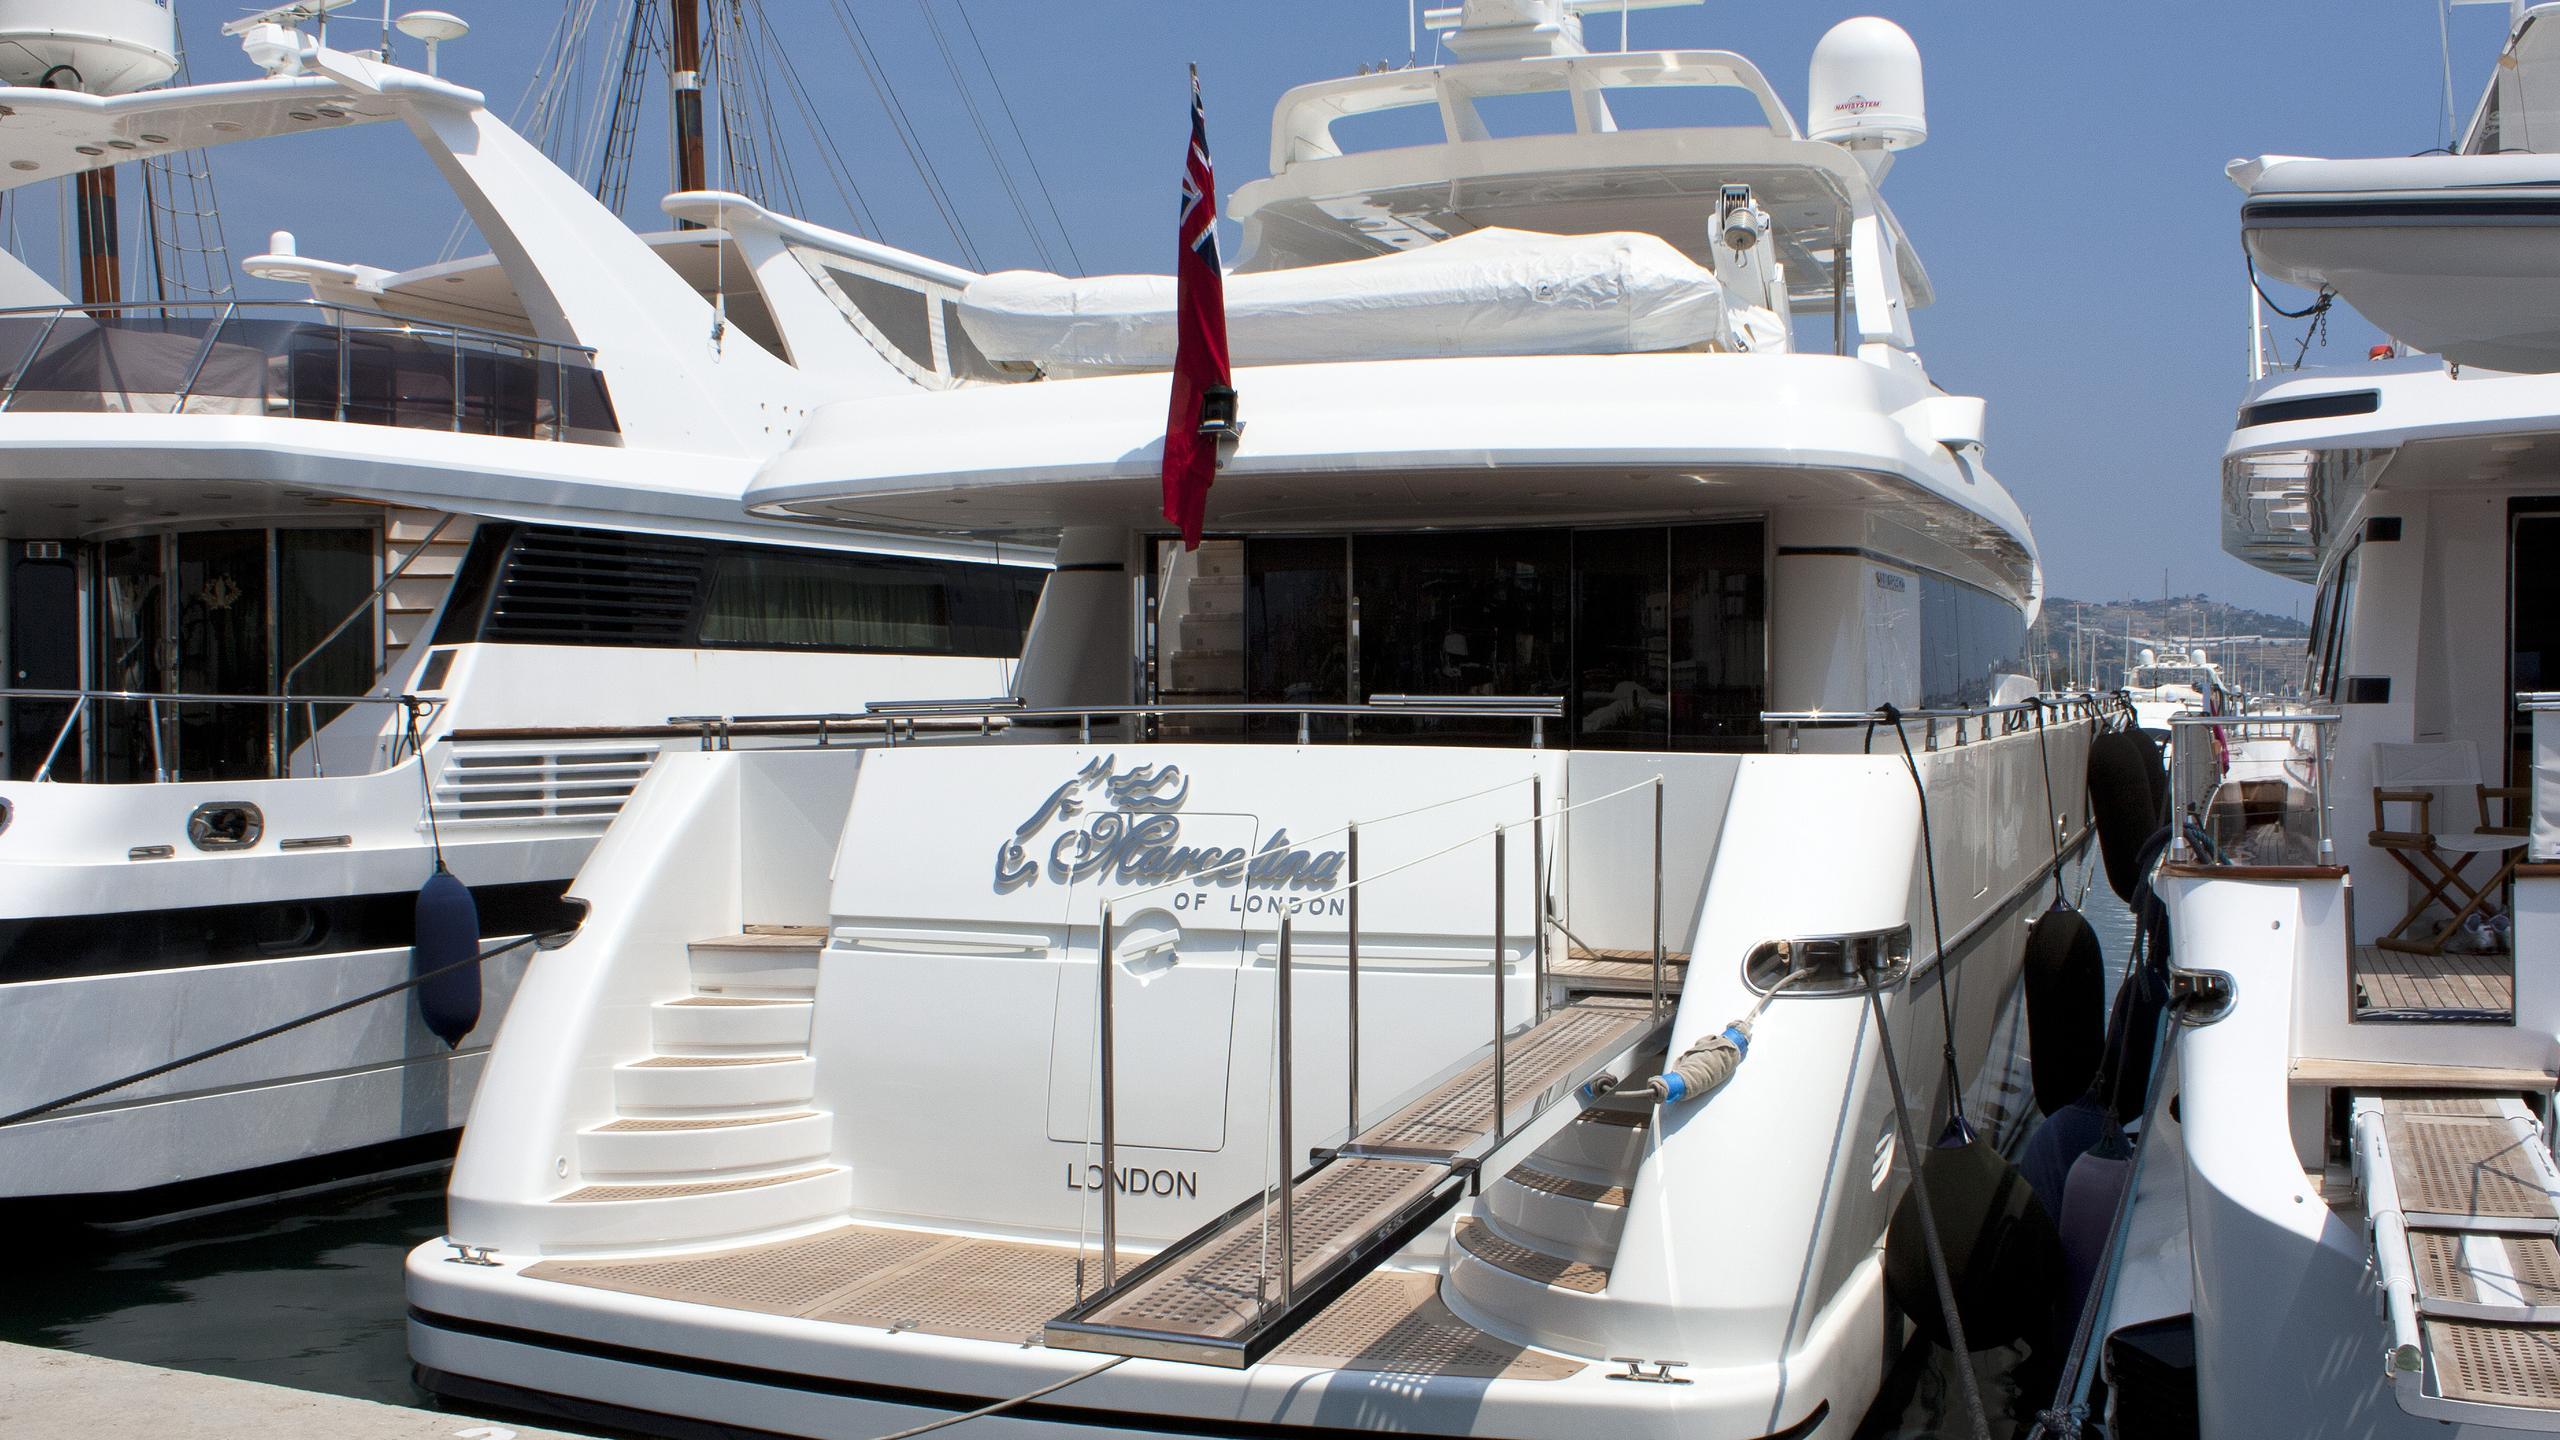 marcelina-of-london-motor-yacht-sanlorenzo-88-2007-27m-stern